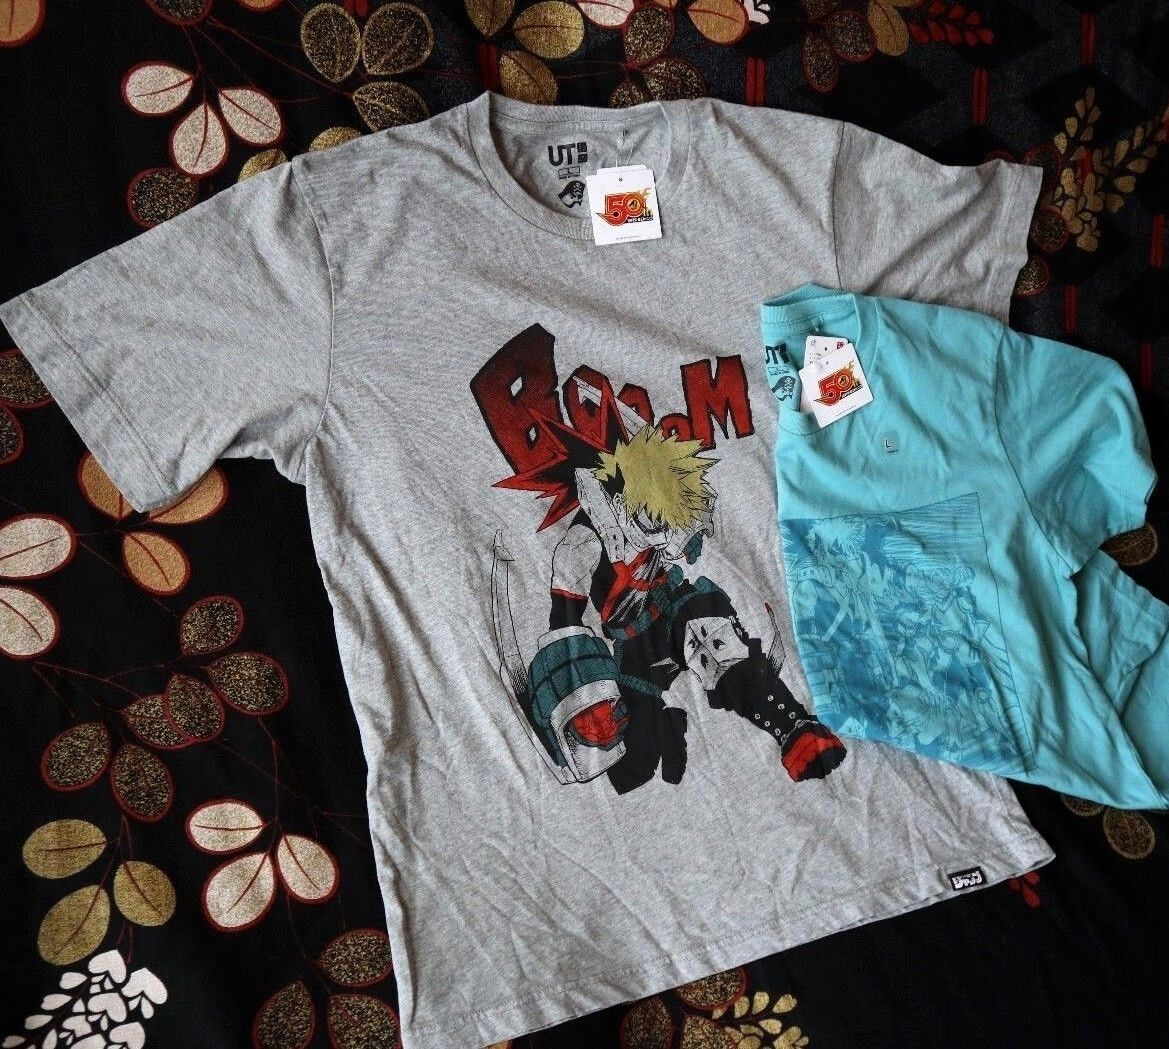 MY HERO ACADEMIA X UNIQLO Shonen Jump 50th T Shirts BAKUGOU XL L Sold Out Rare